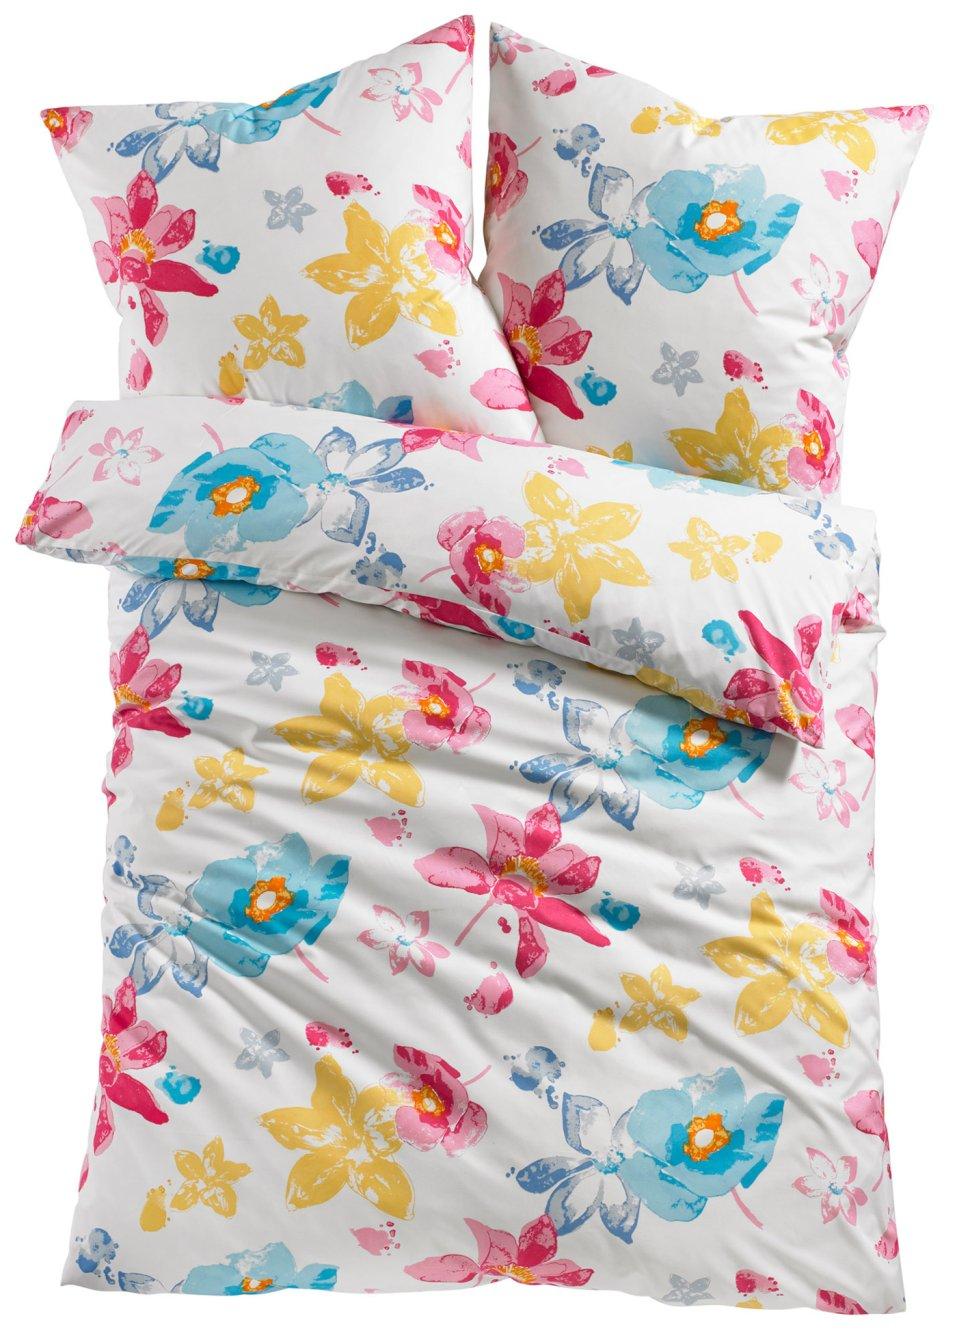 neu 2 tlg bettw sche set garnitur blumen flowers fr hling. Black Bedroom Furniture Sets. Home Design Ideas